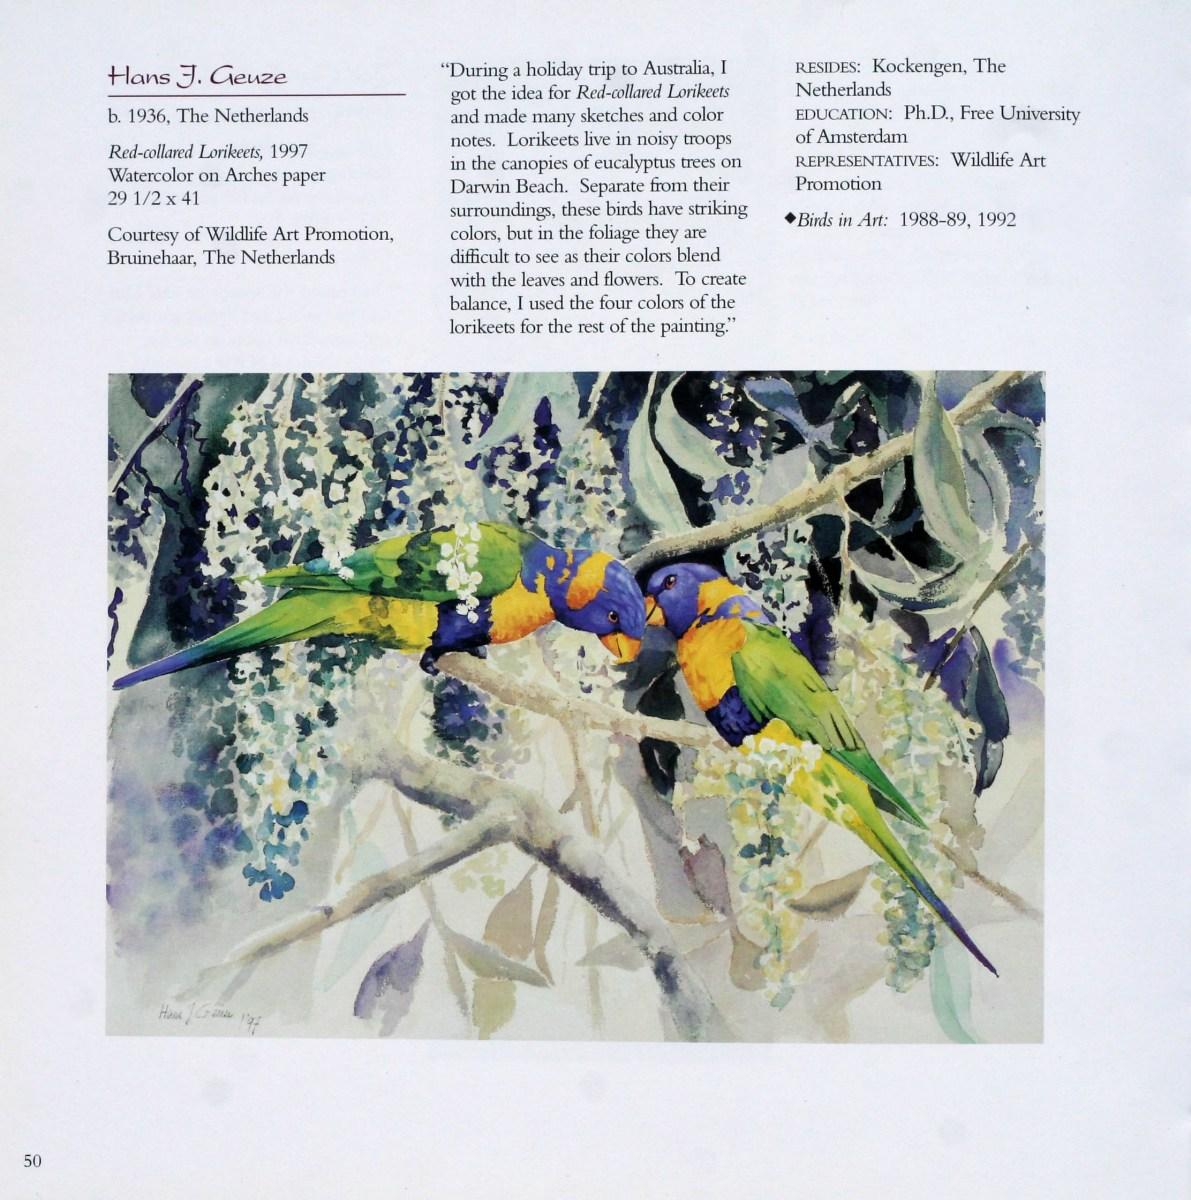 Birds-in-Art-1998